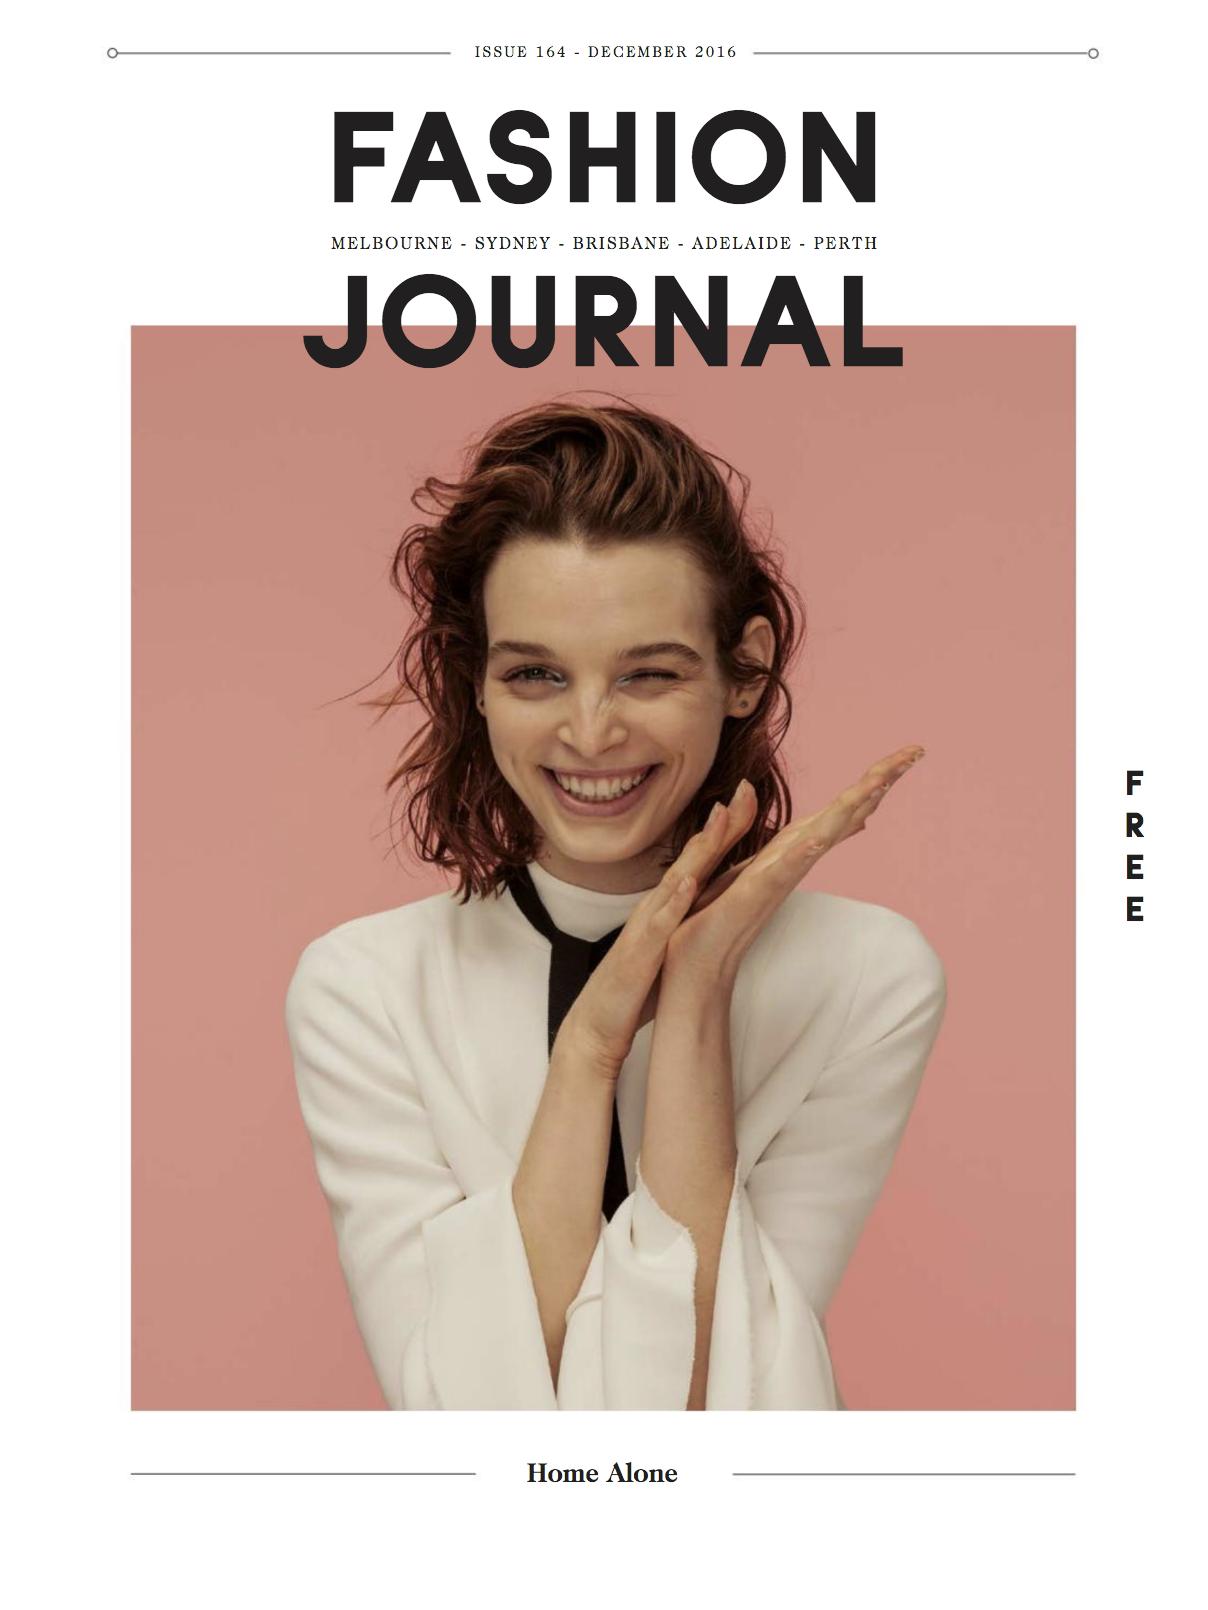 Fashion Journal Magazine Fashion Inspiration Style Ideas Fashion Journals Email Design Inspiration Web Layout Design